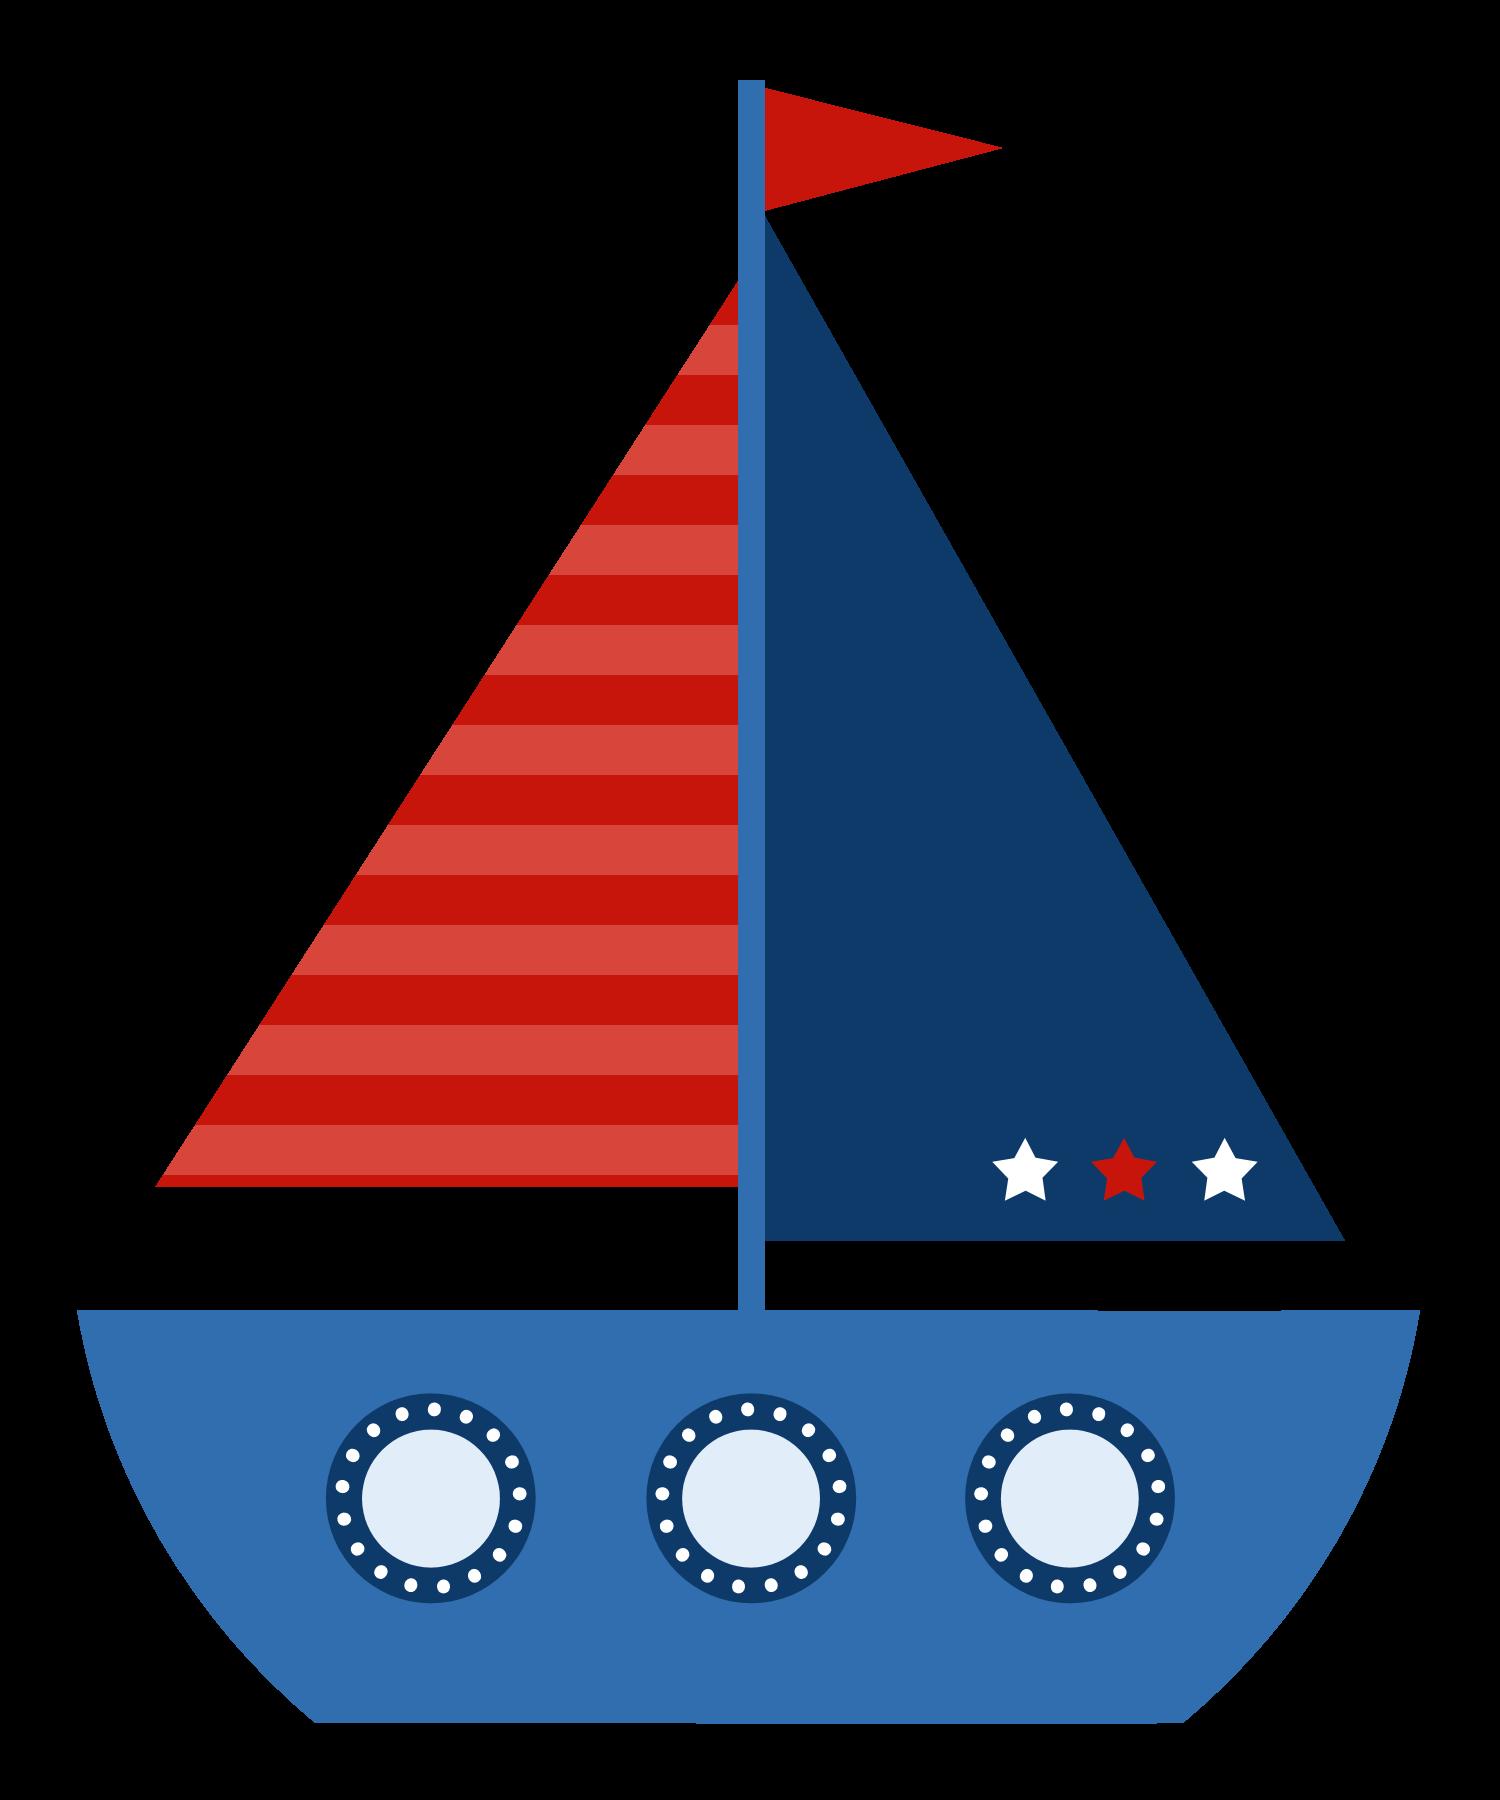 free Navy clipart nautical. Corujinha beb png pesquisa.